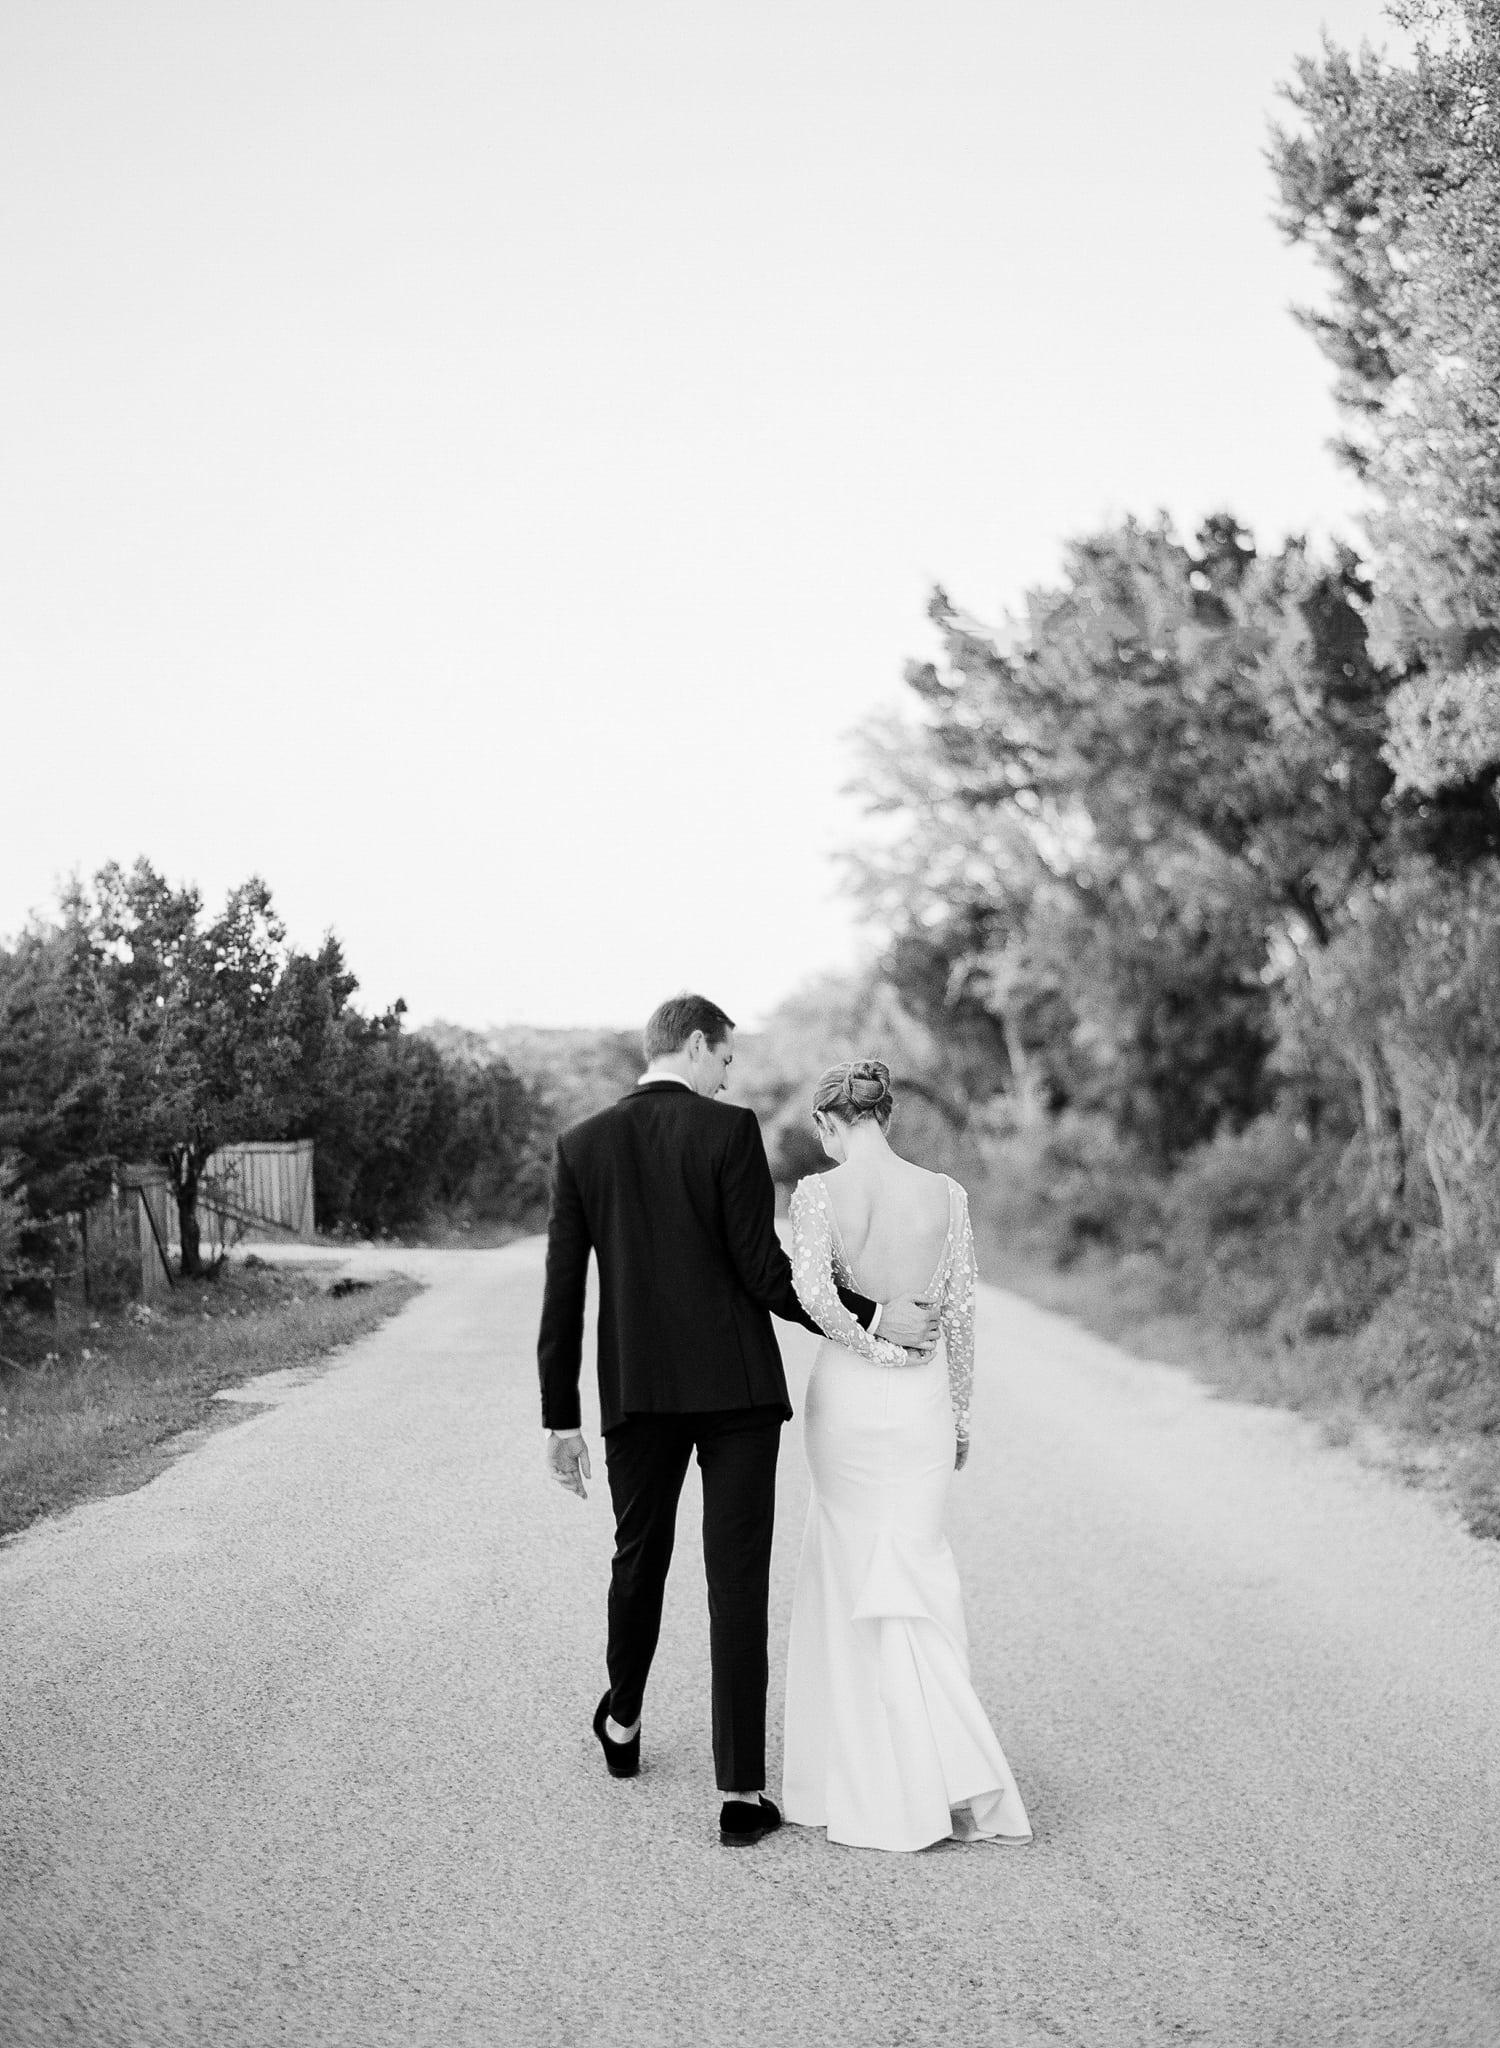 PROSPECT_HOUSE_WEDDING_AUSTIN_TX_MATTHEW_MOORE-00804-2.jpg